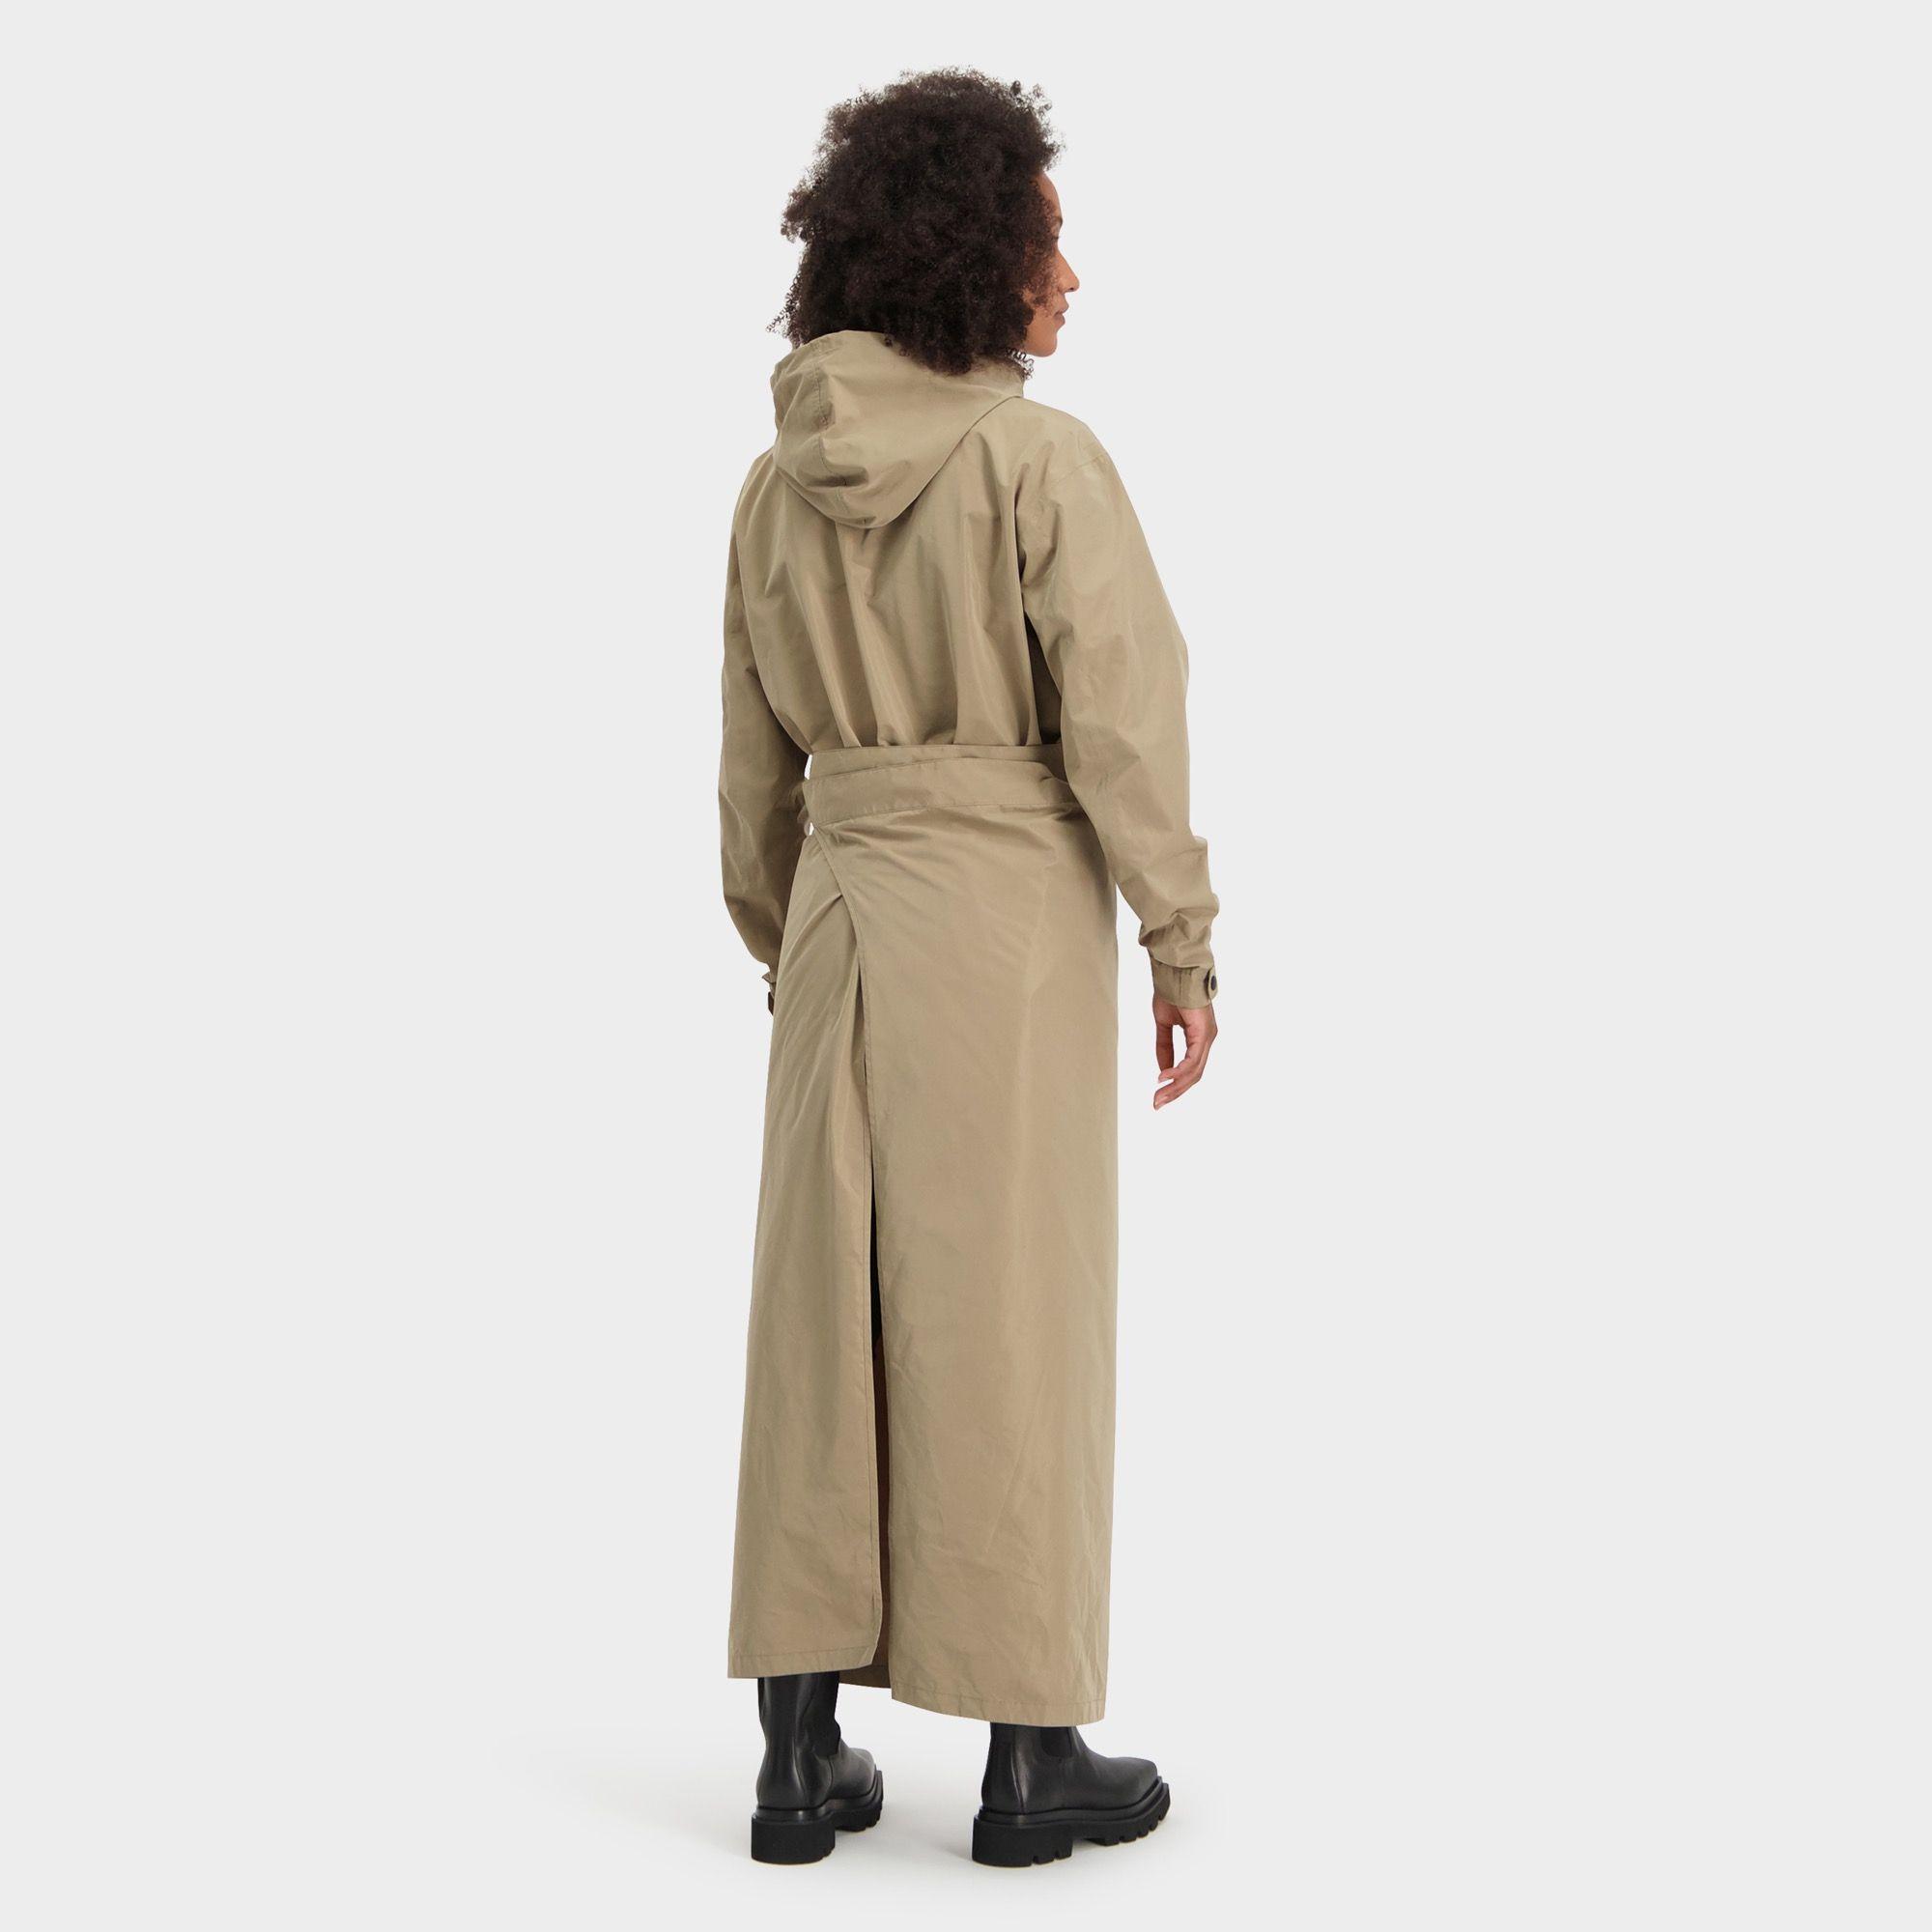 Rain Dress Anorak Urban Outdoor Dames fit example